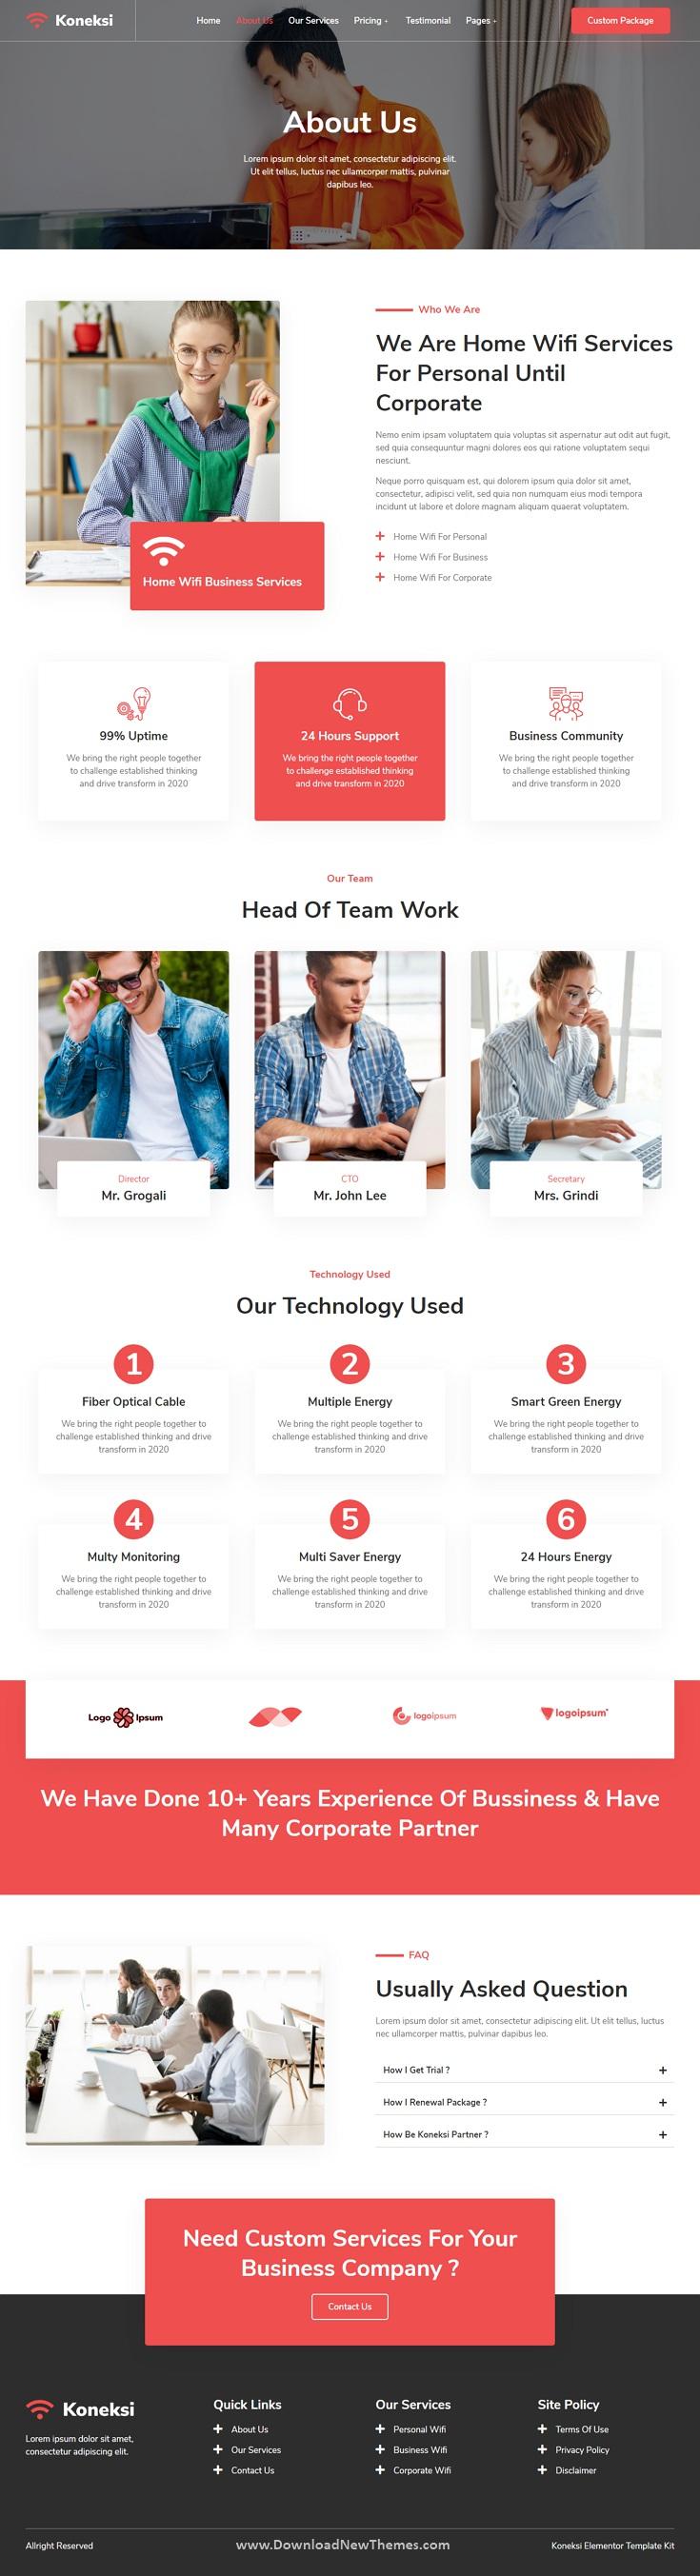 Koneksi - Home Wifi Internet Services Elementor Template Kit